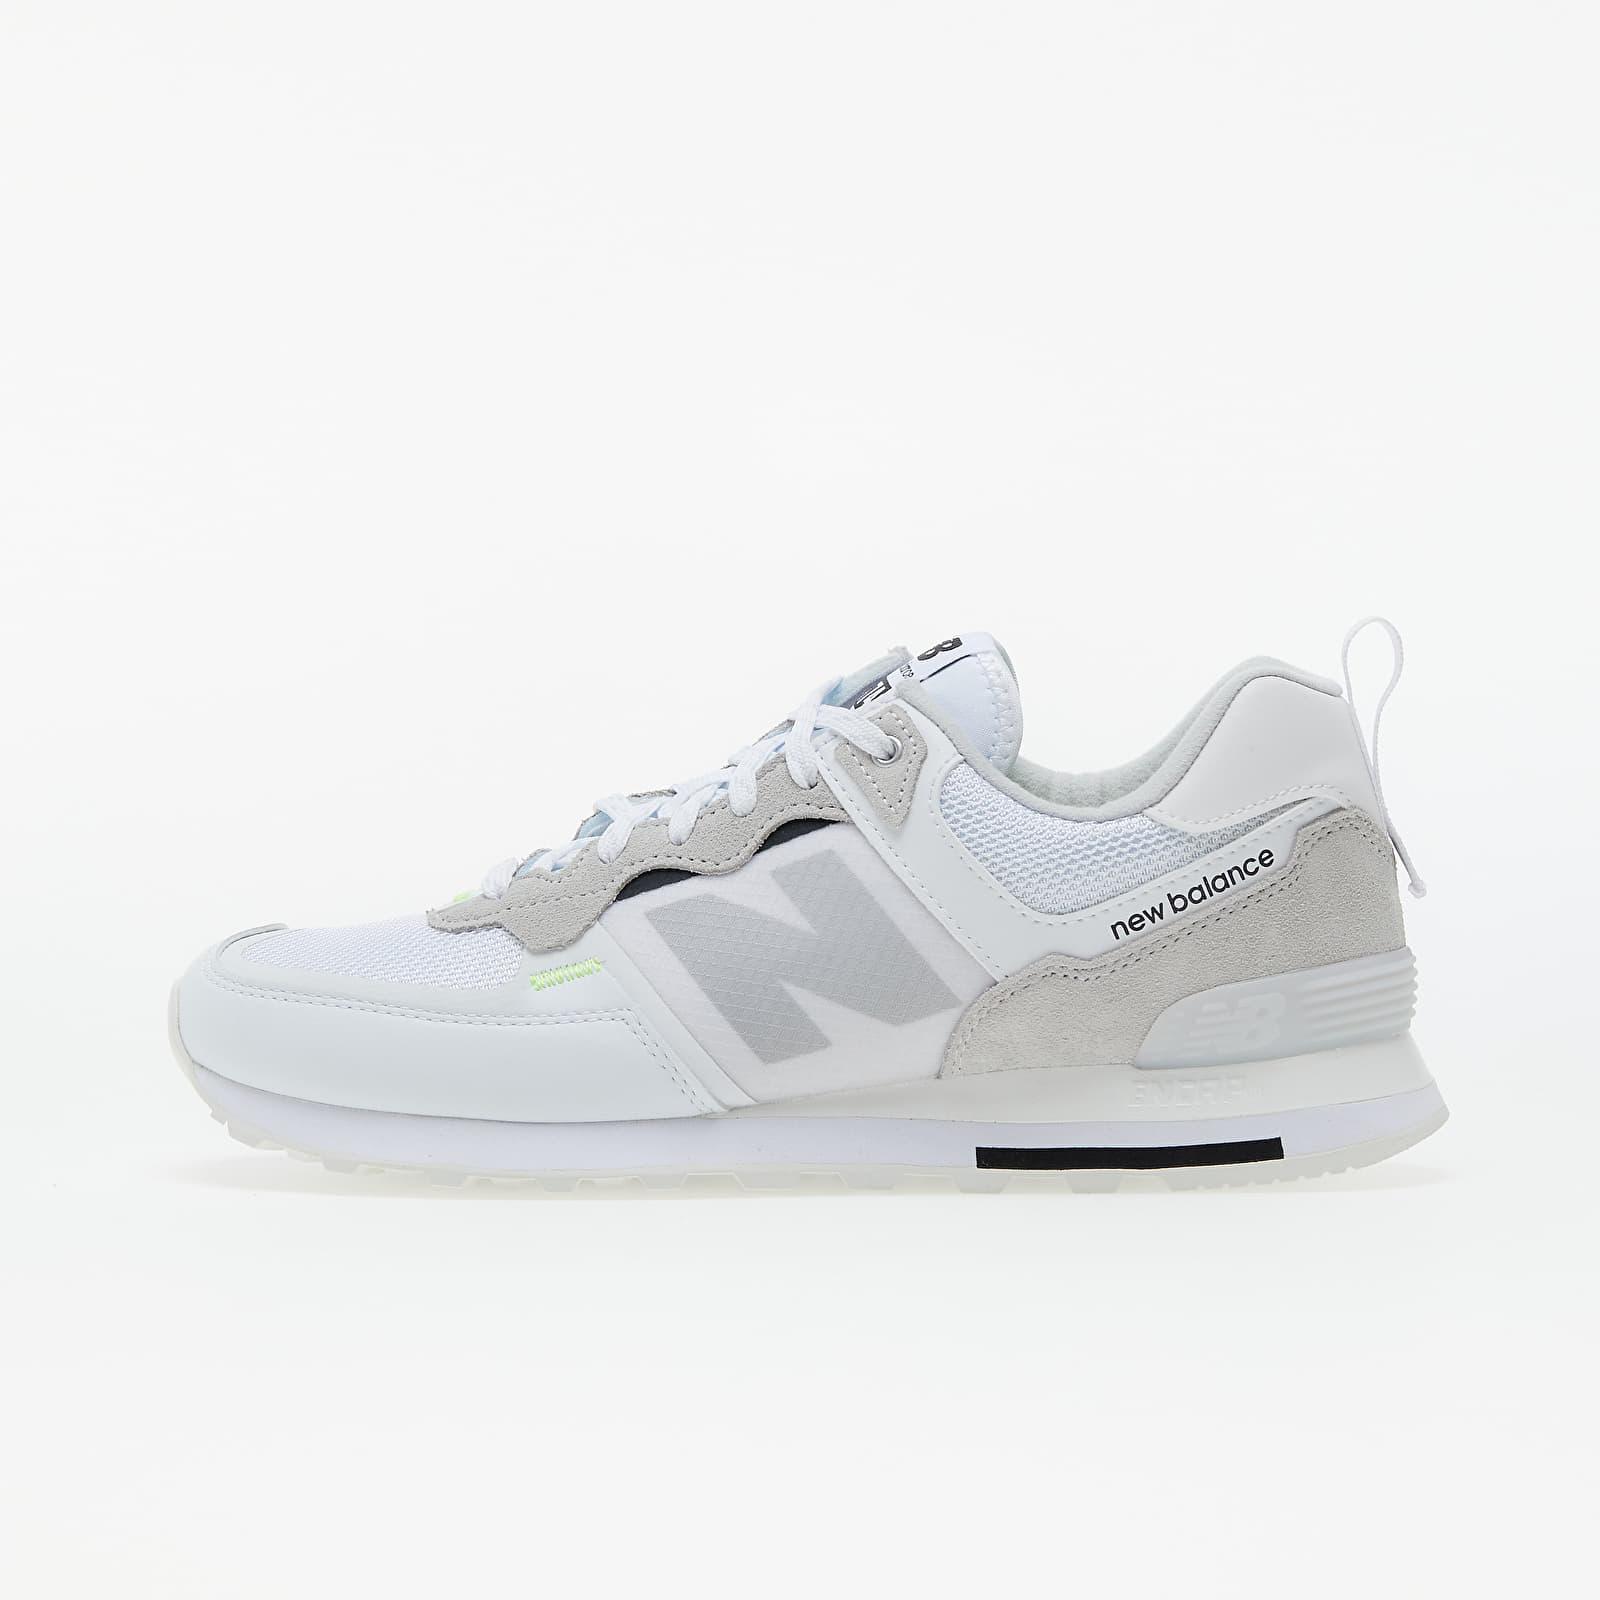 New Balance 574 White/ Grey EUR 41.5